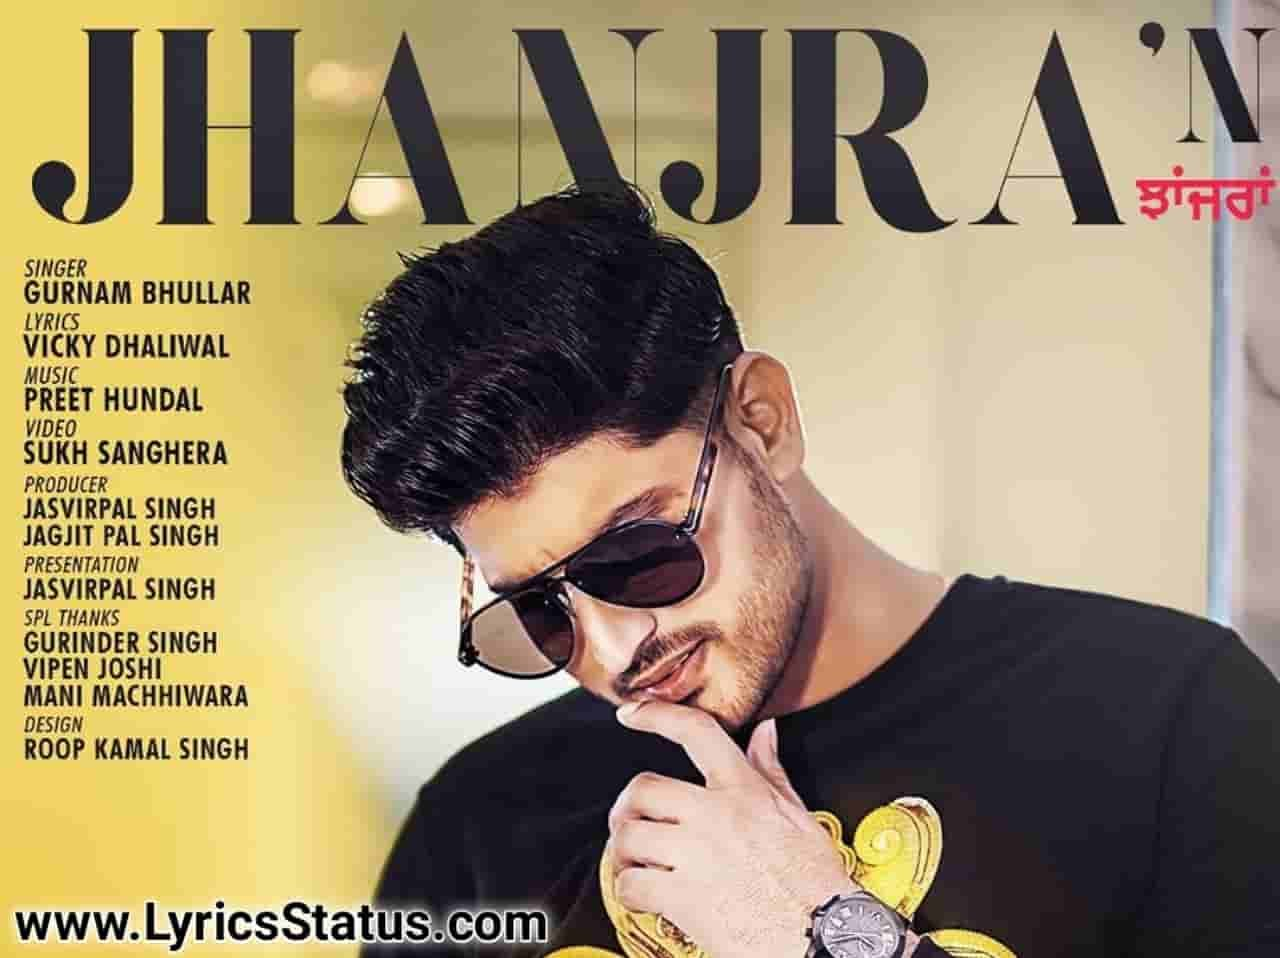 Gurnam Bhullar New Song Jhanjran Lyrics Status Download punjabi song Gucci naal chandi diyan khehn Jhanjran Goreyan pairan nu boch boch rakhdi